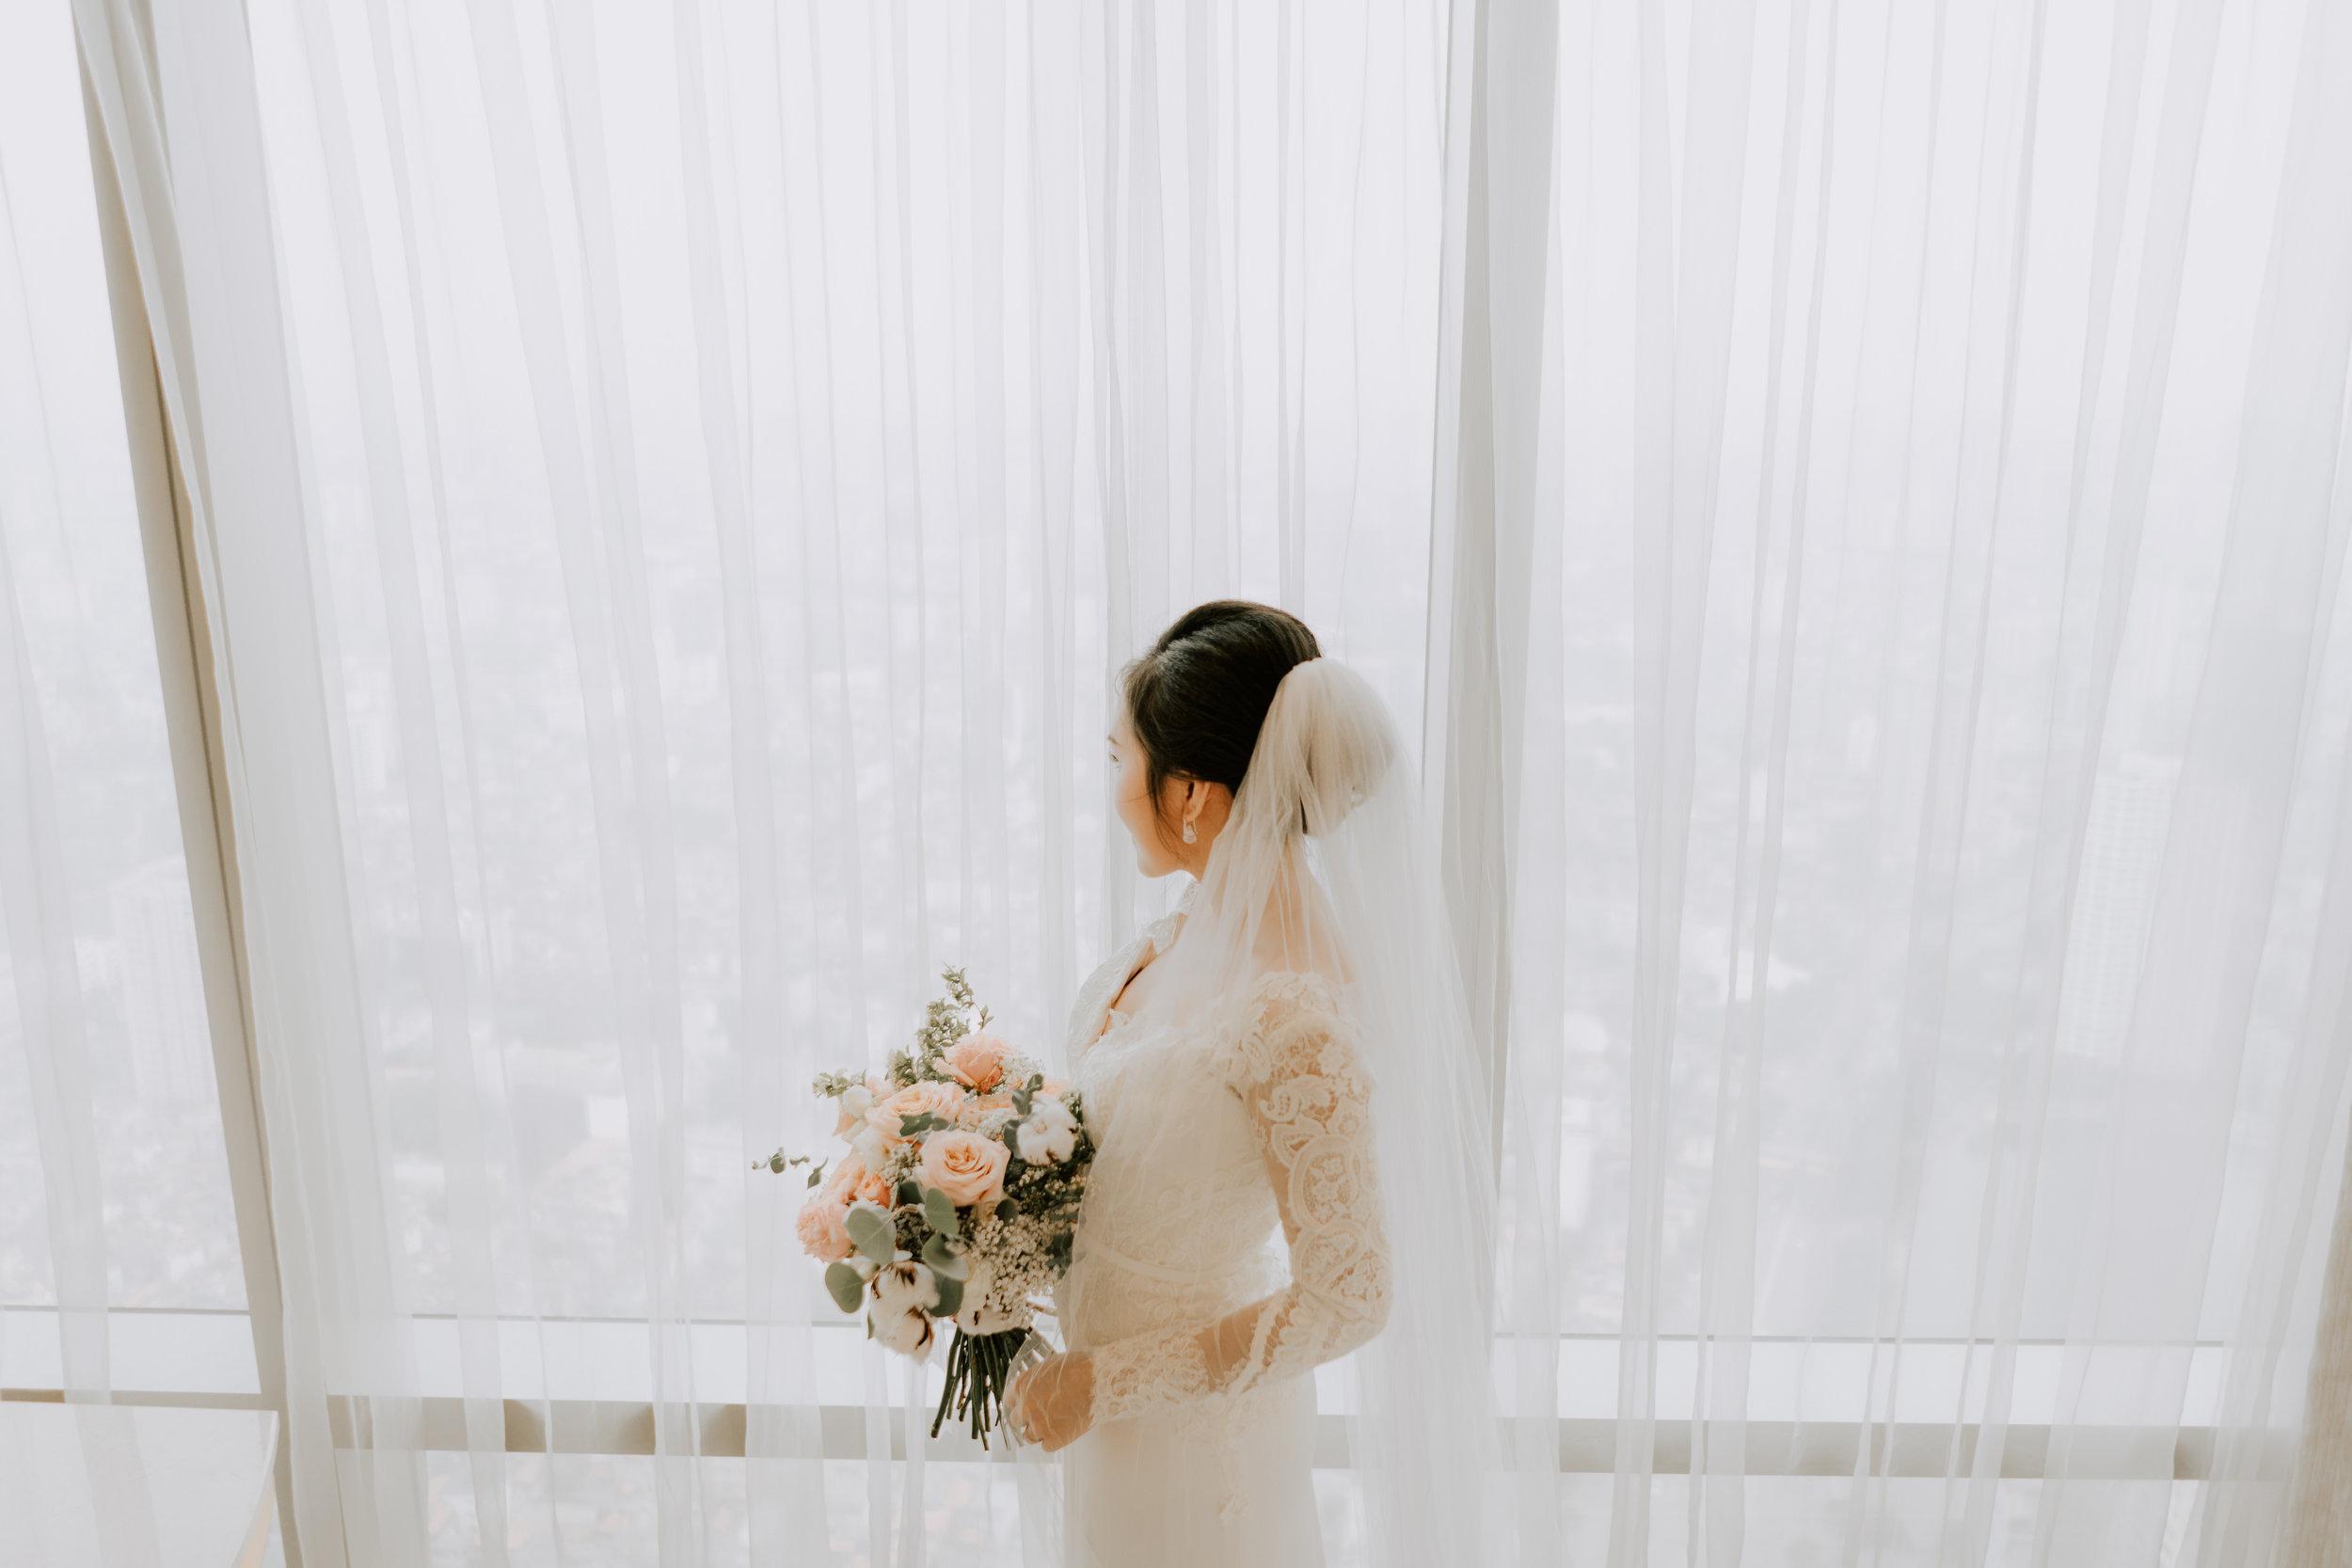 Mirrorwedding Destination Photographer TopofHanoi Duc Anh Hien Trang 162020.jpg